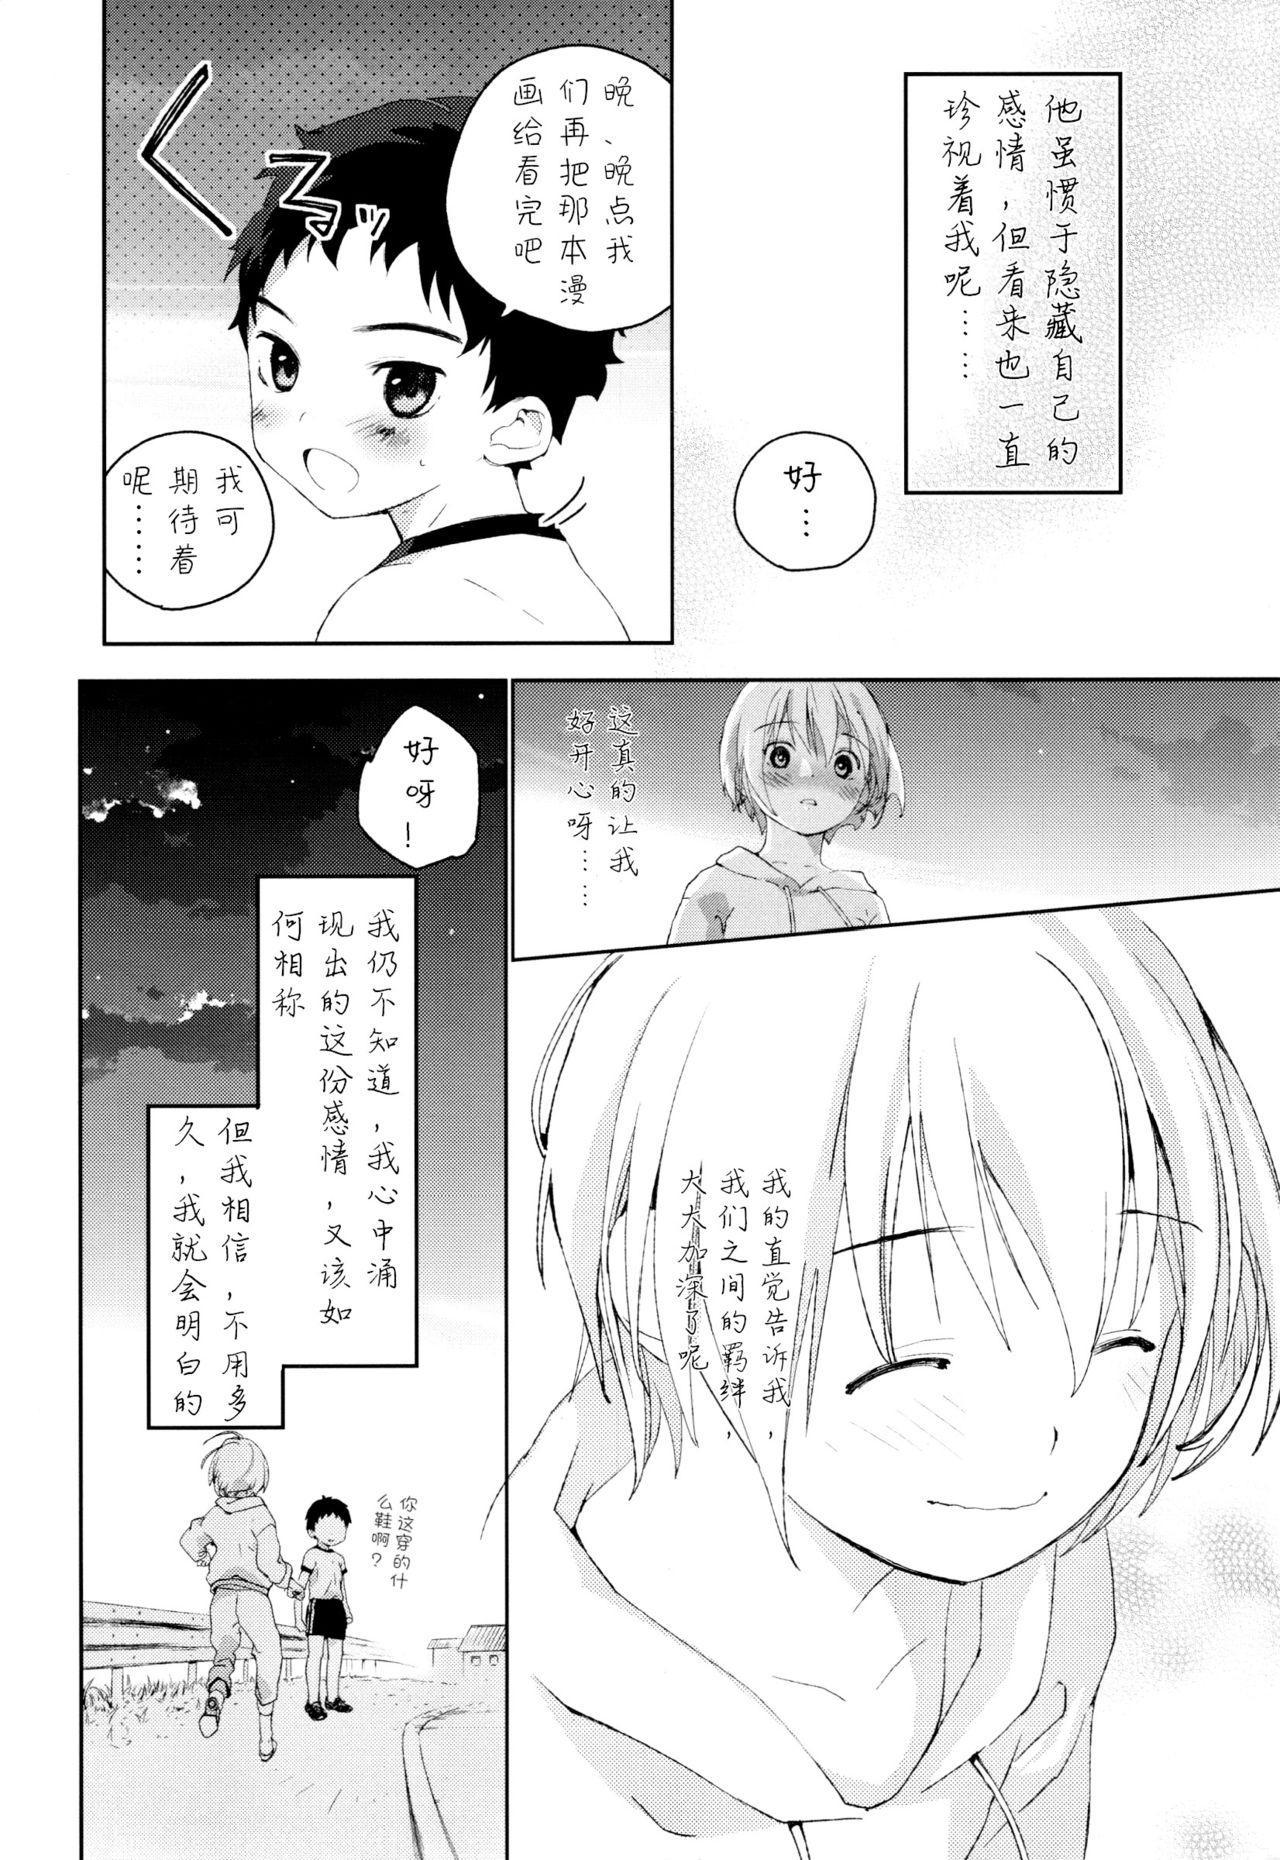 Osananajimi | 青梅竹马 54